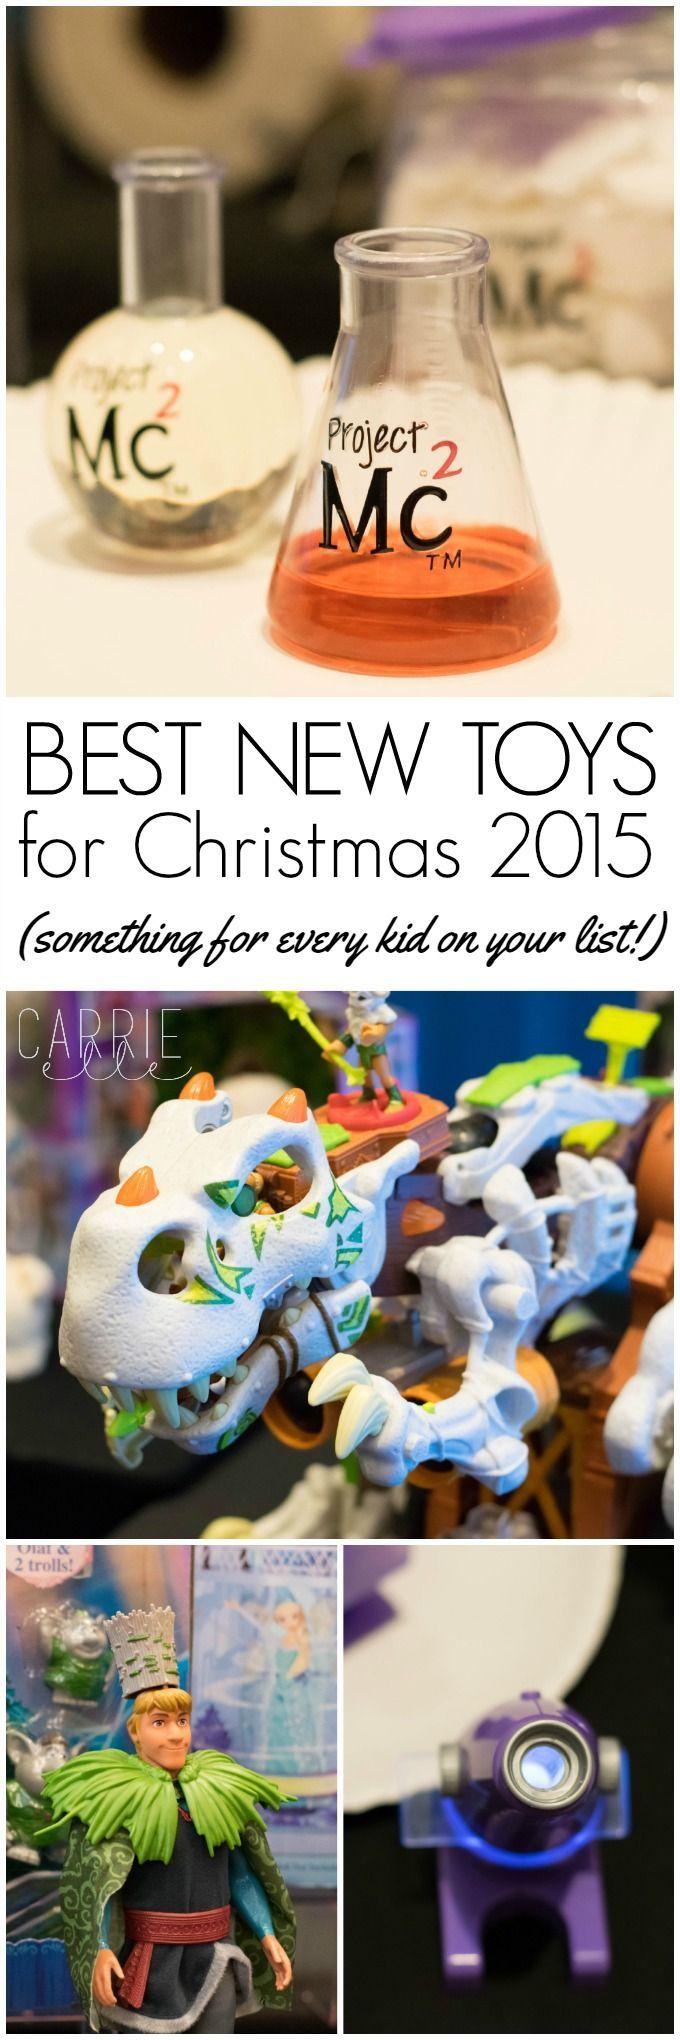 Best Toys for Kids - Holidays 2015 #ChosenByKids sponsored #TheList